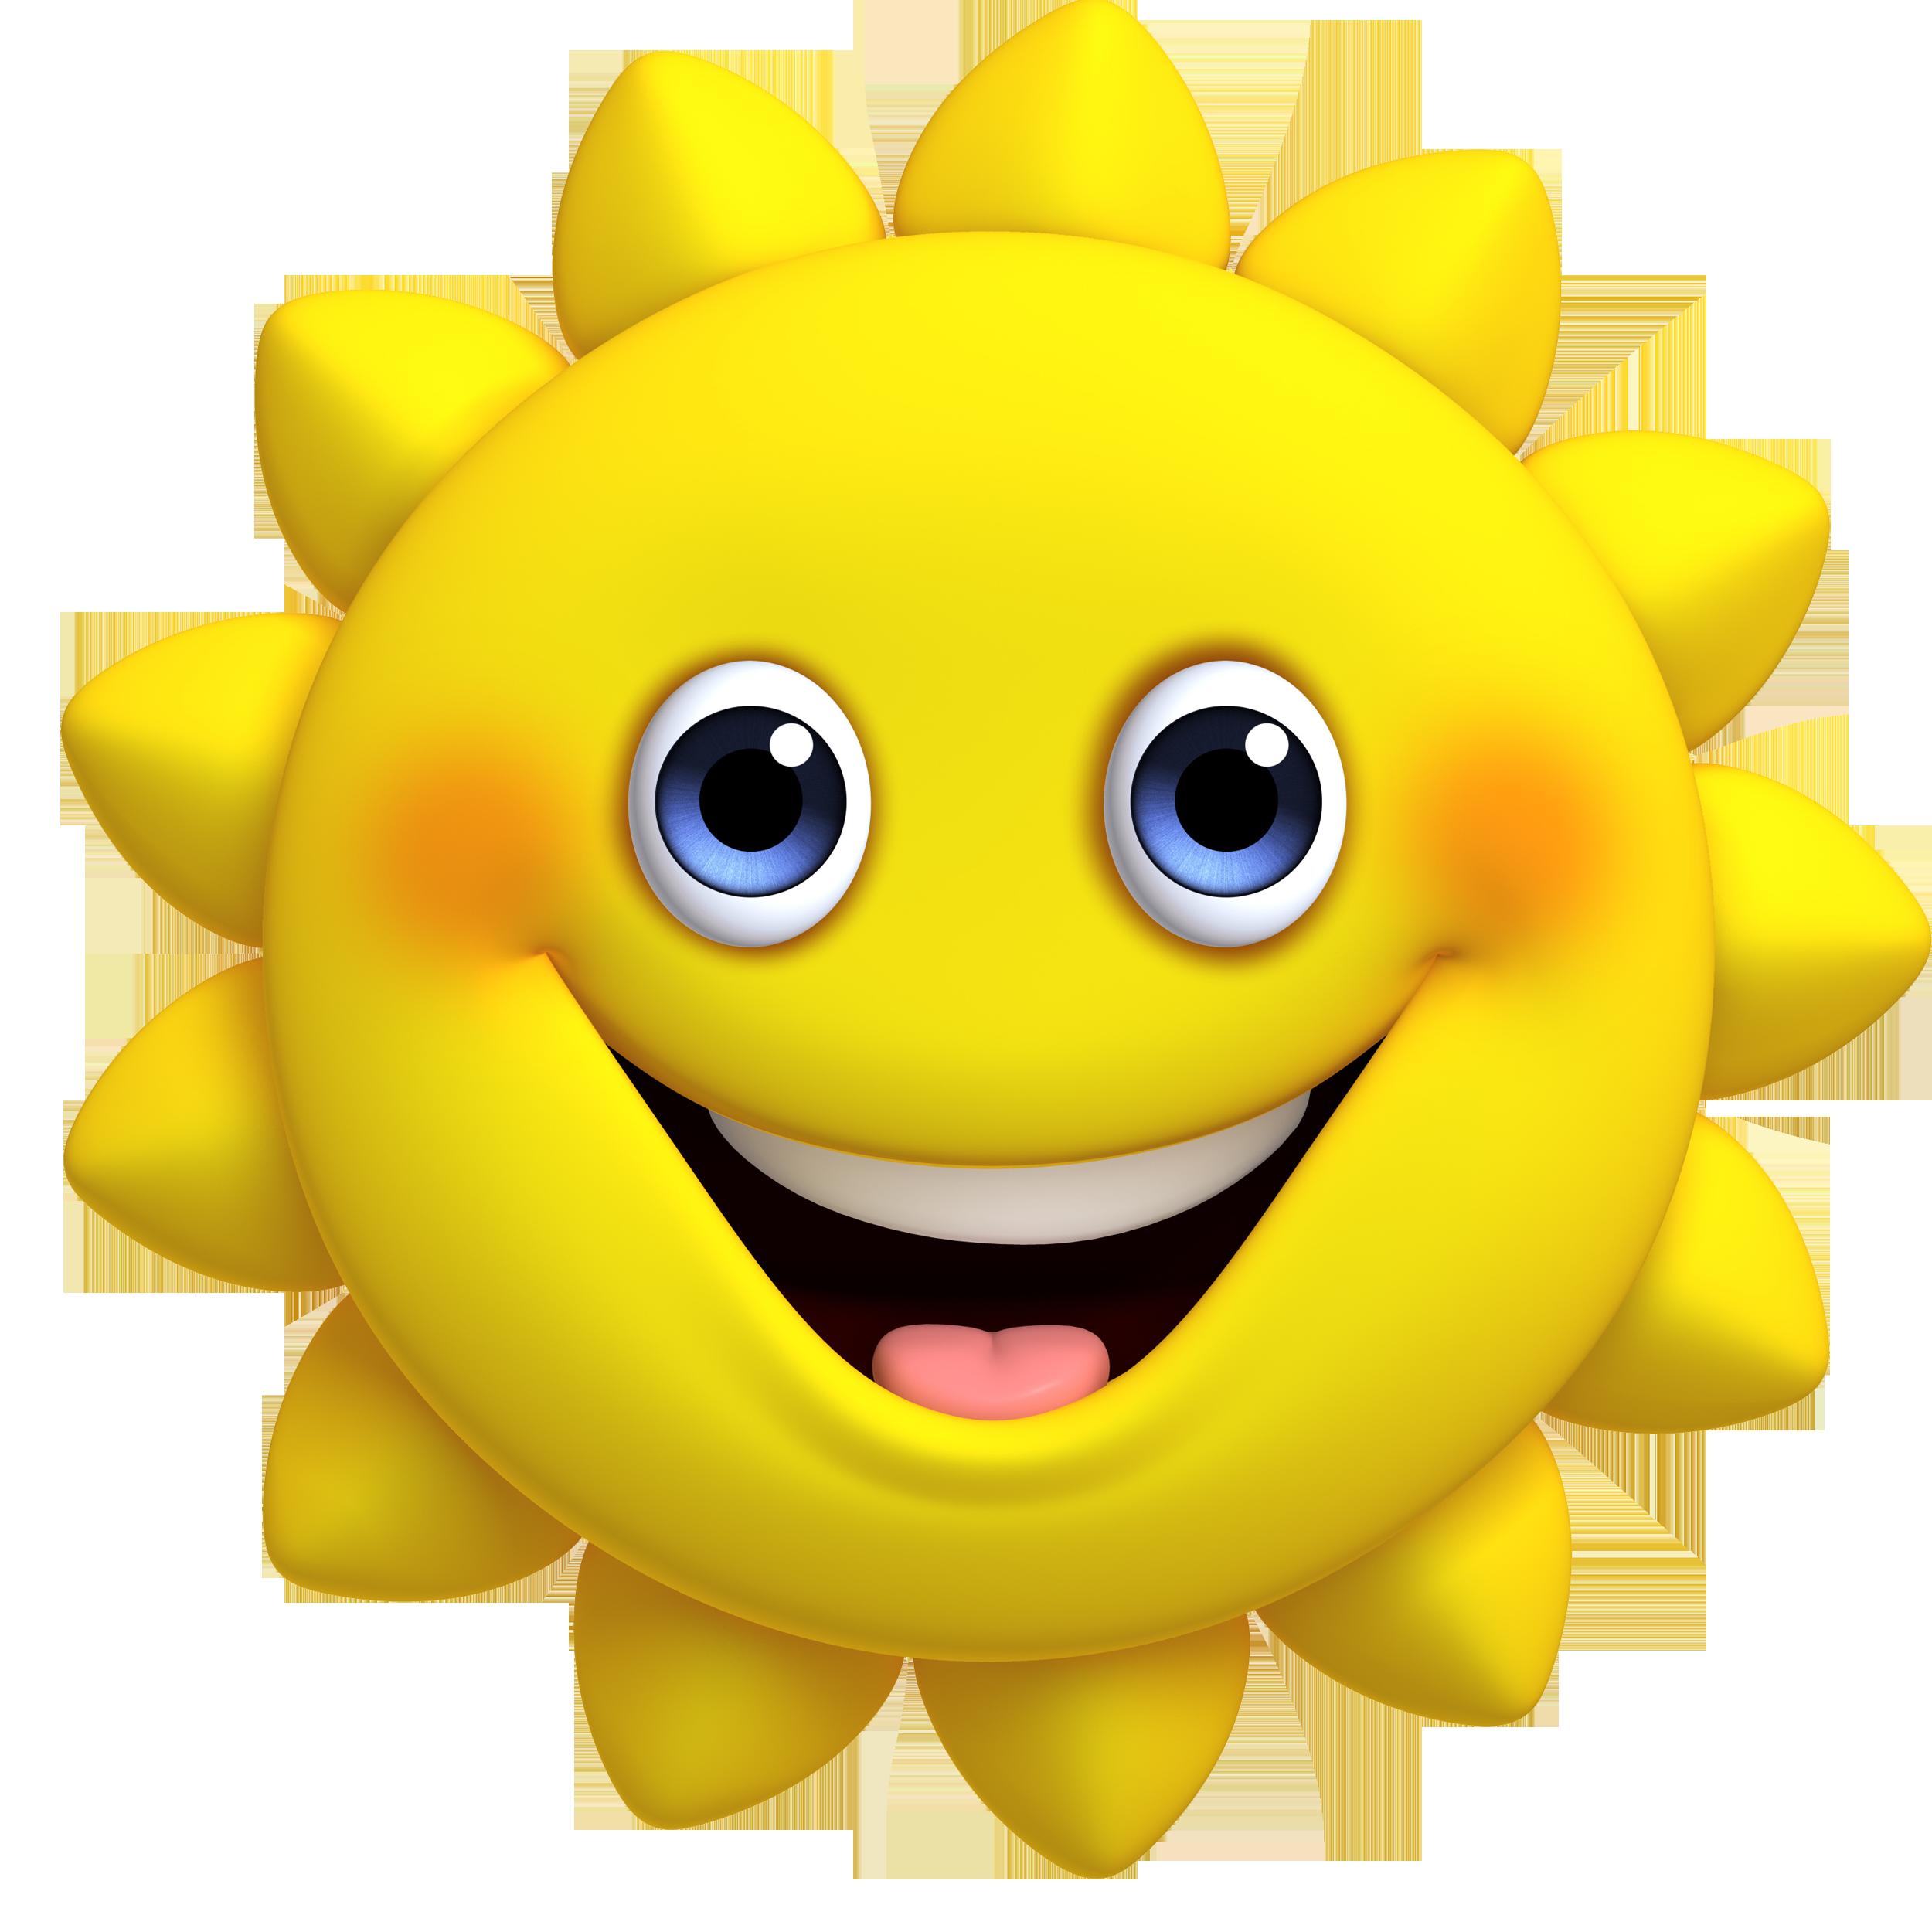 Cute sun cartoon clipart picture library download Cartoon cute sun 2500*2500 transprent Png Free Download - Emoticon ... picture library download